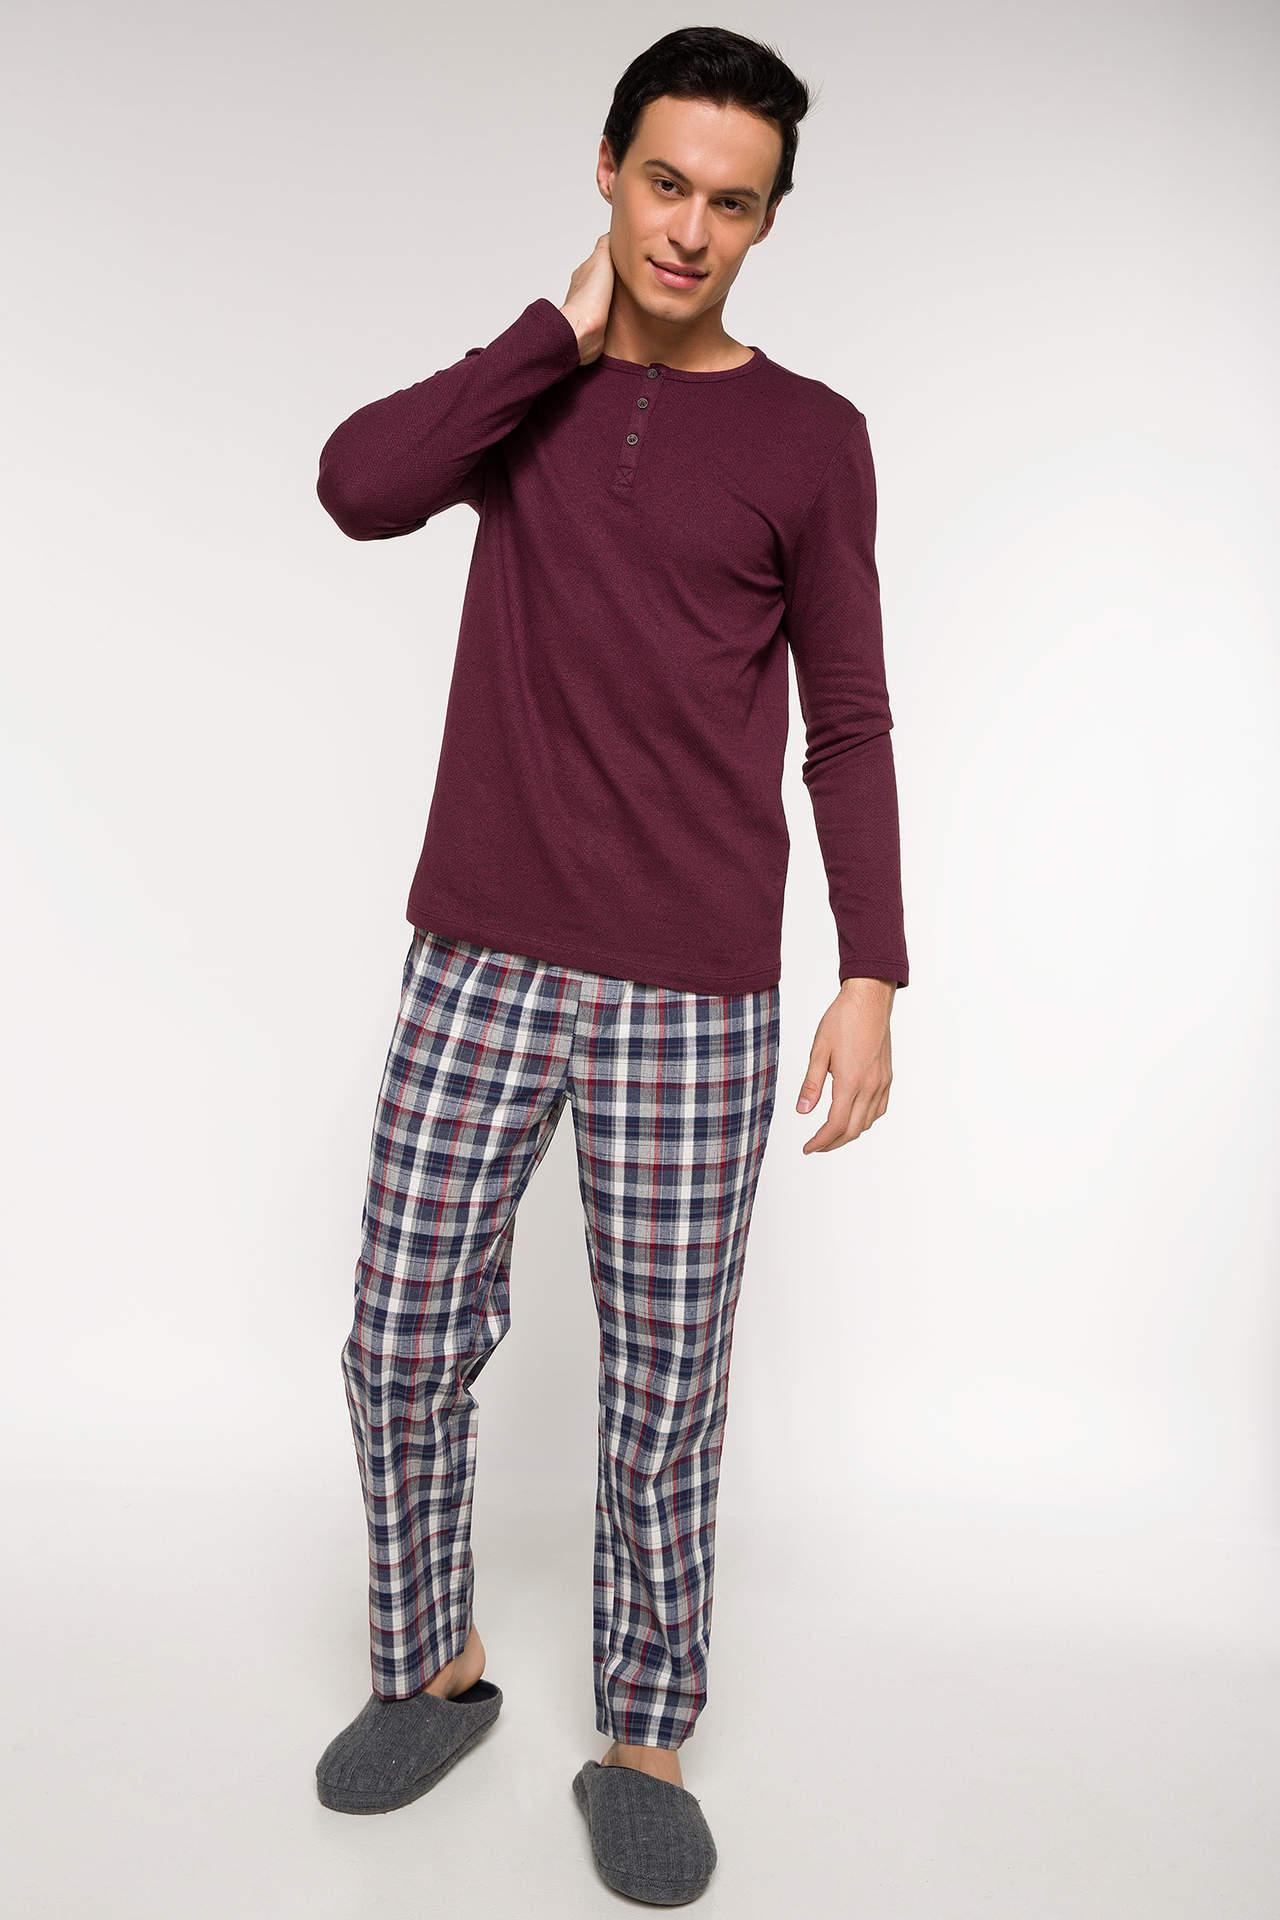 DeFacto Erkek Slim Fit Gadart Yaka Pijama Takımı Bordo male